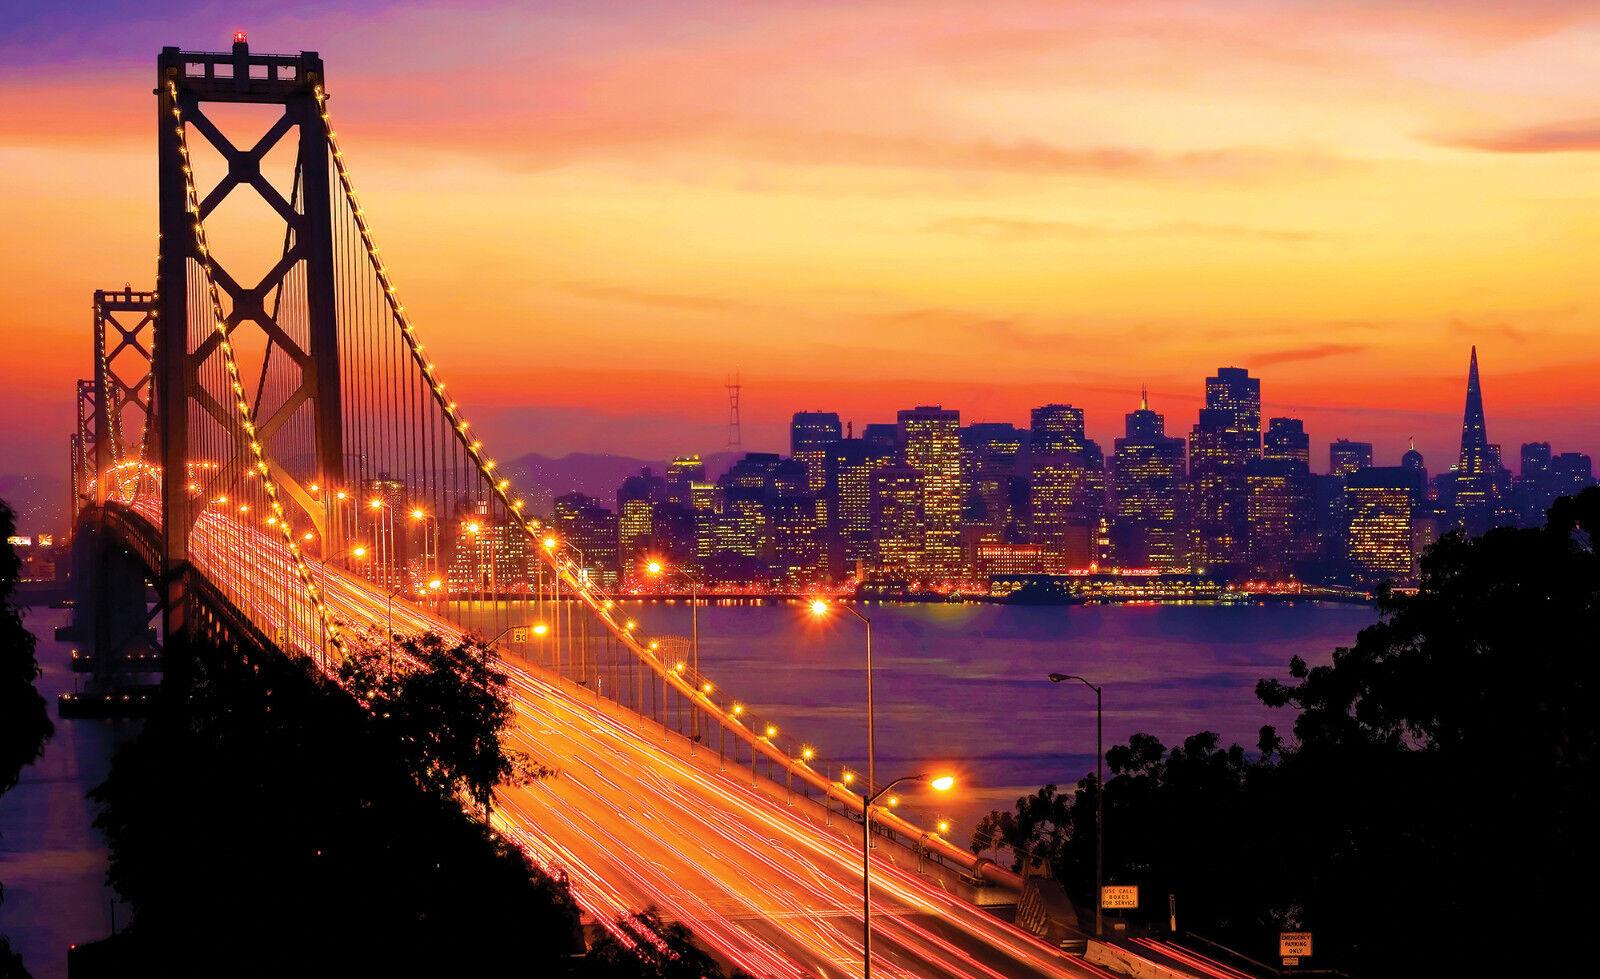 VLIES Fototapete-BAY BRIDGE-(418)-San Franciso Stadt Kalifornien Pazifik Golden